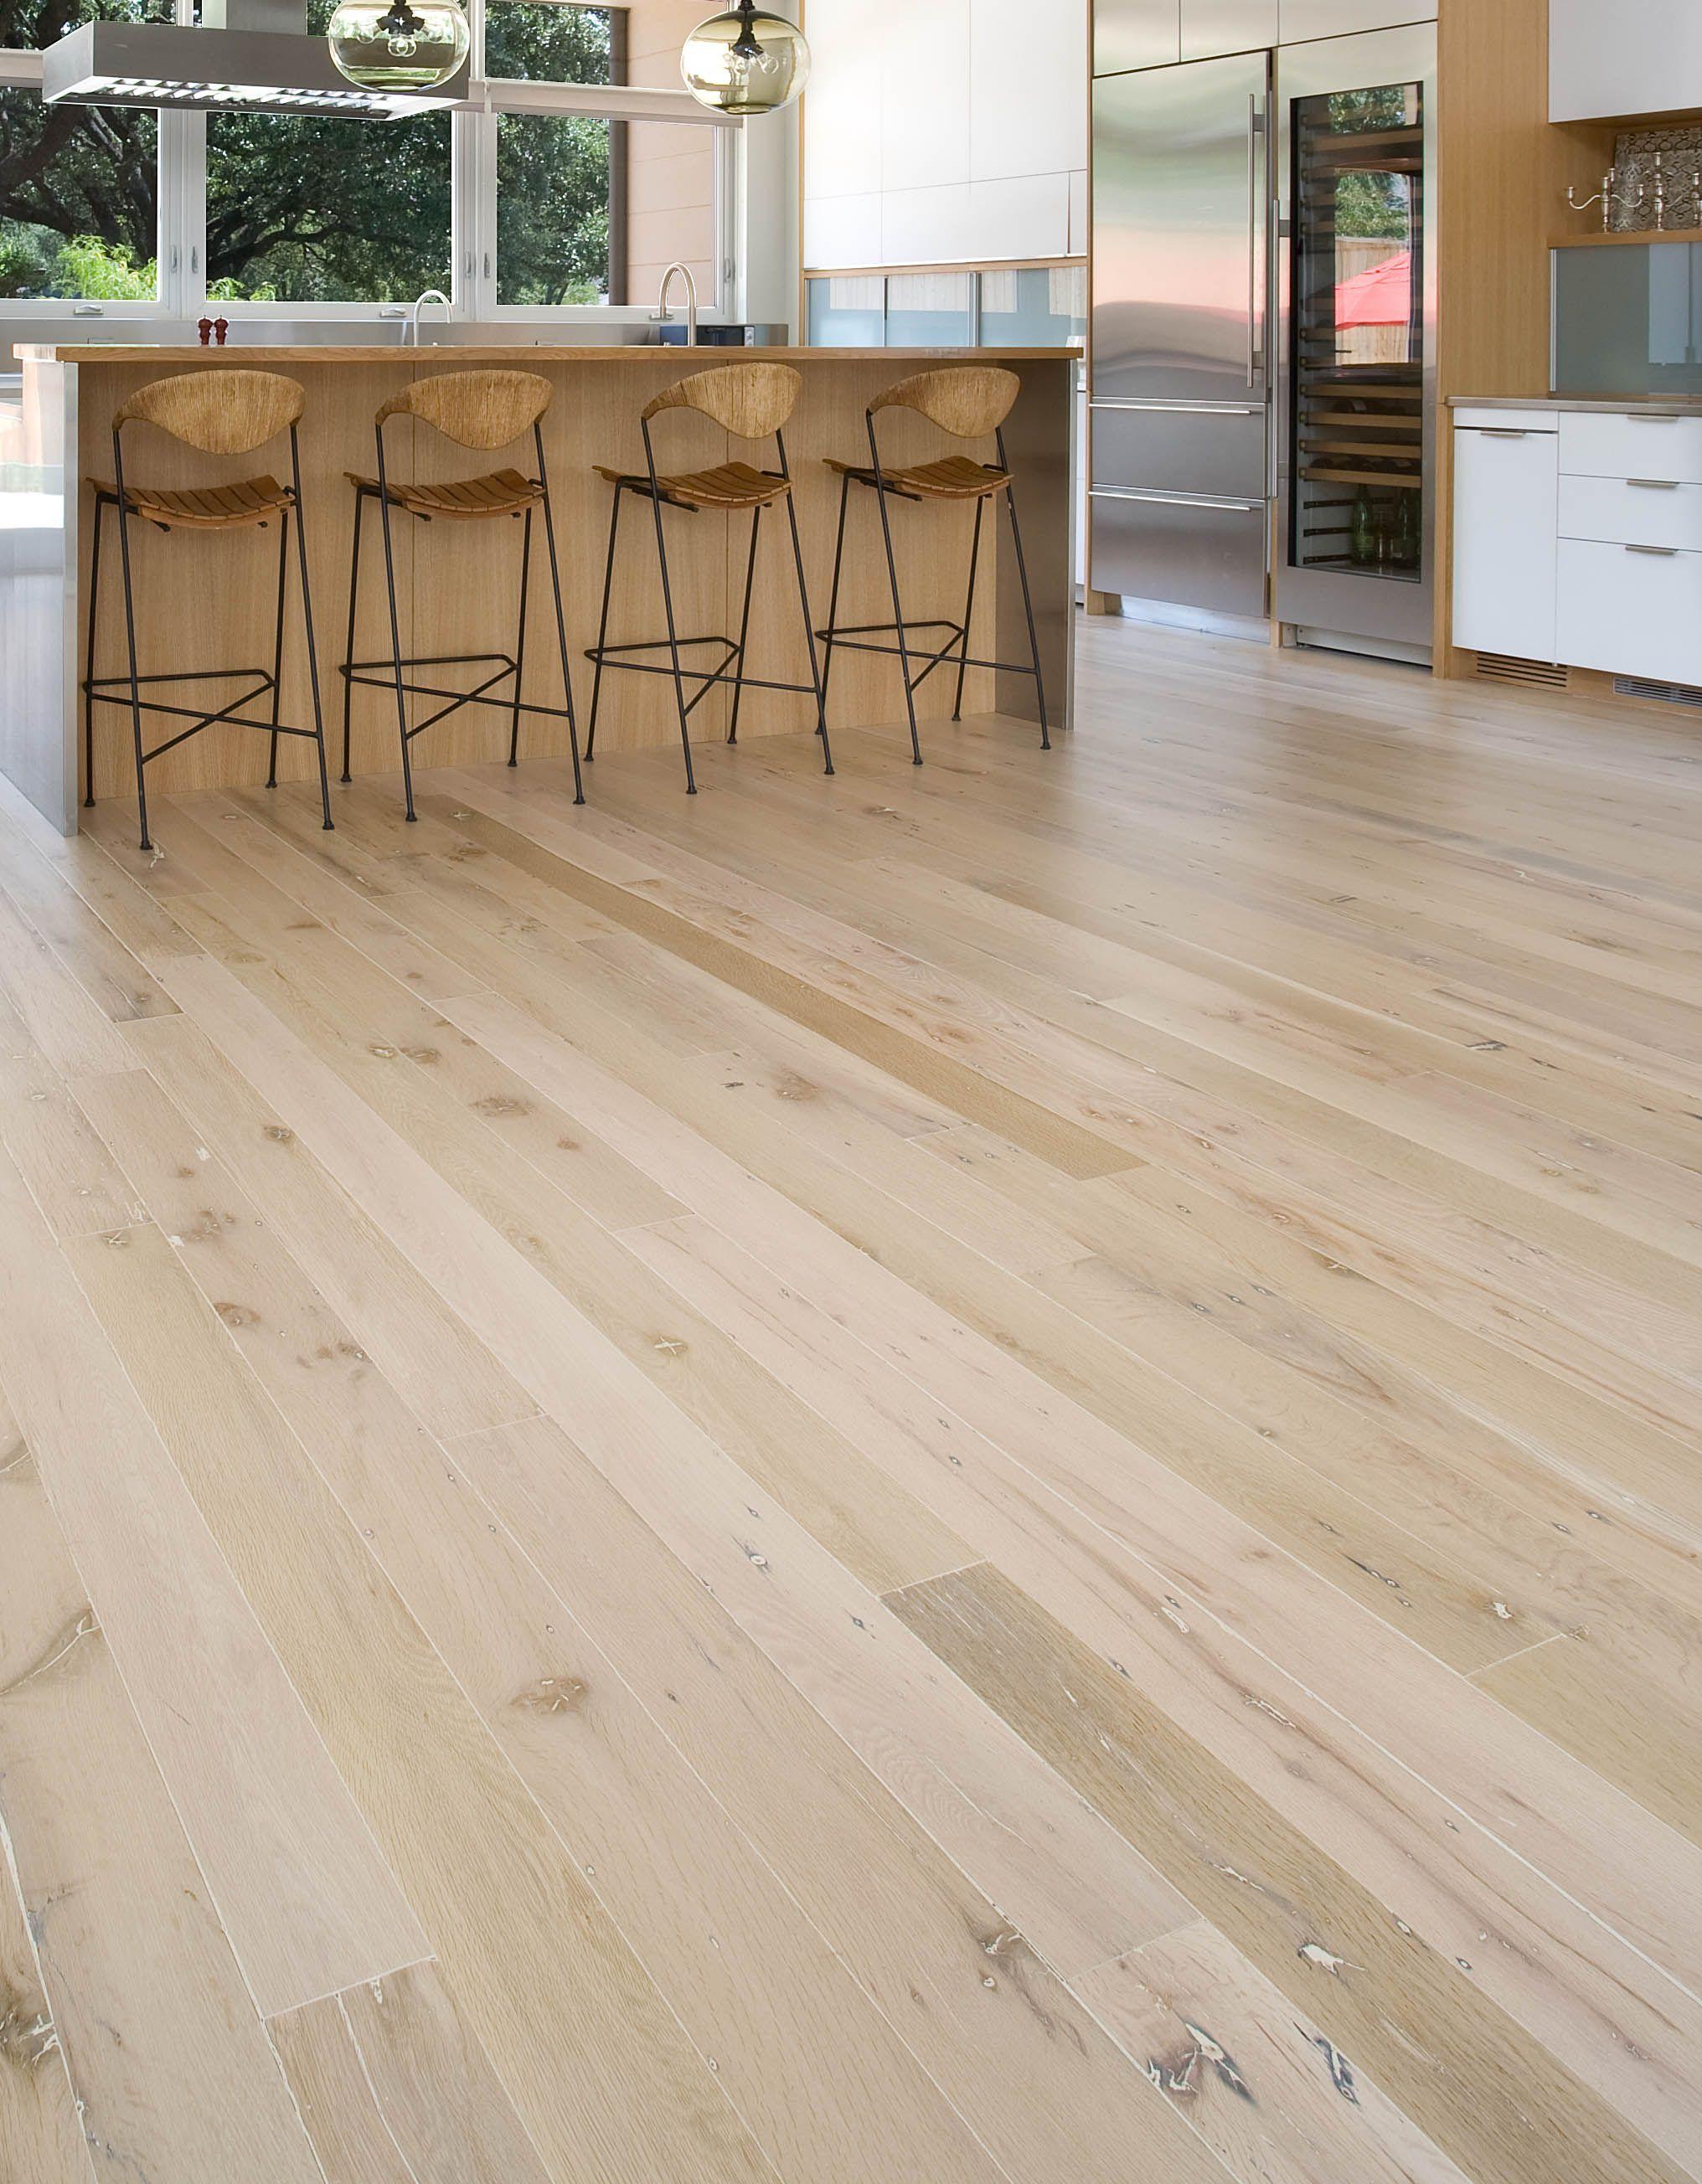 white oak flooring white oak wood flooring from reclaimed timber - materialicious RNXDUHR